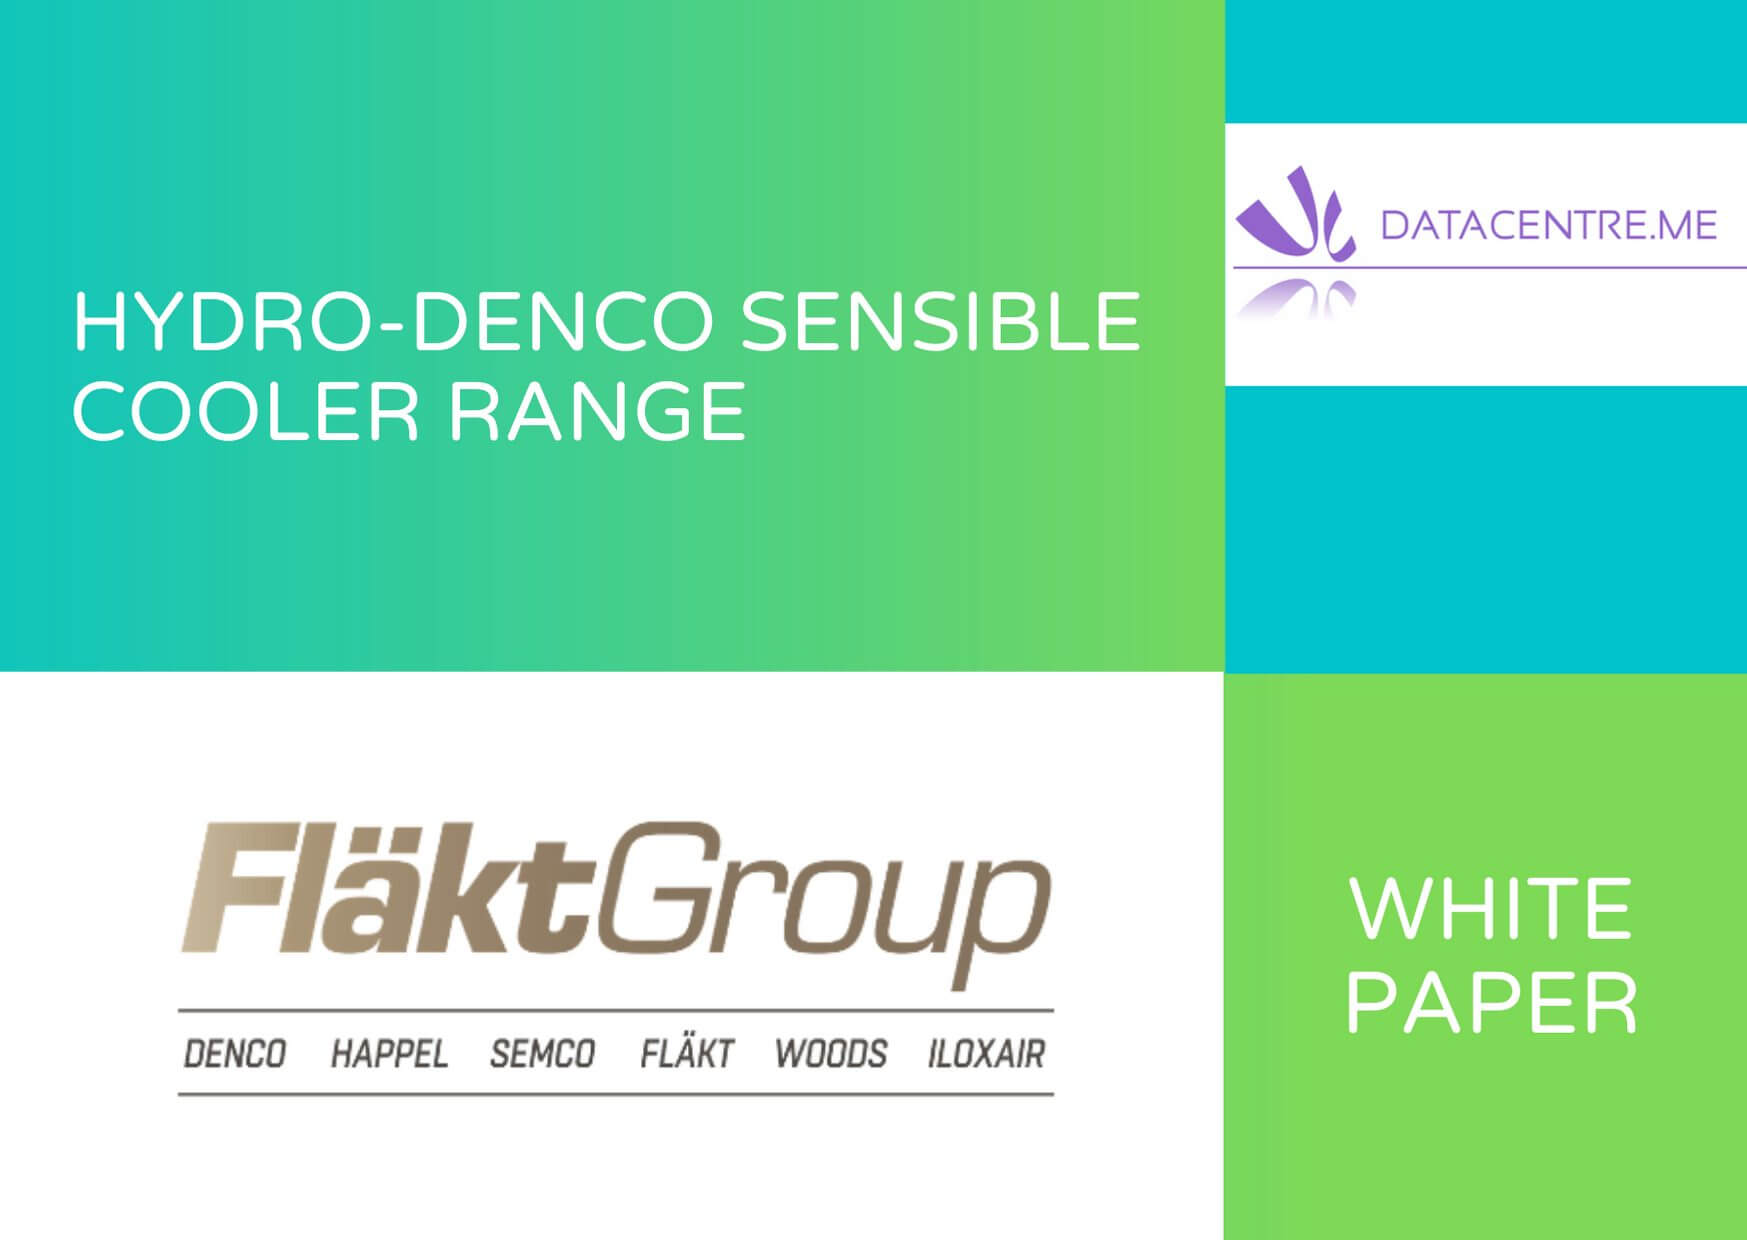 FlaktGroup White Paper - Hydro-Denco Sensible Cooler Range Image